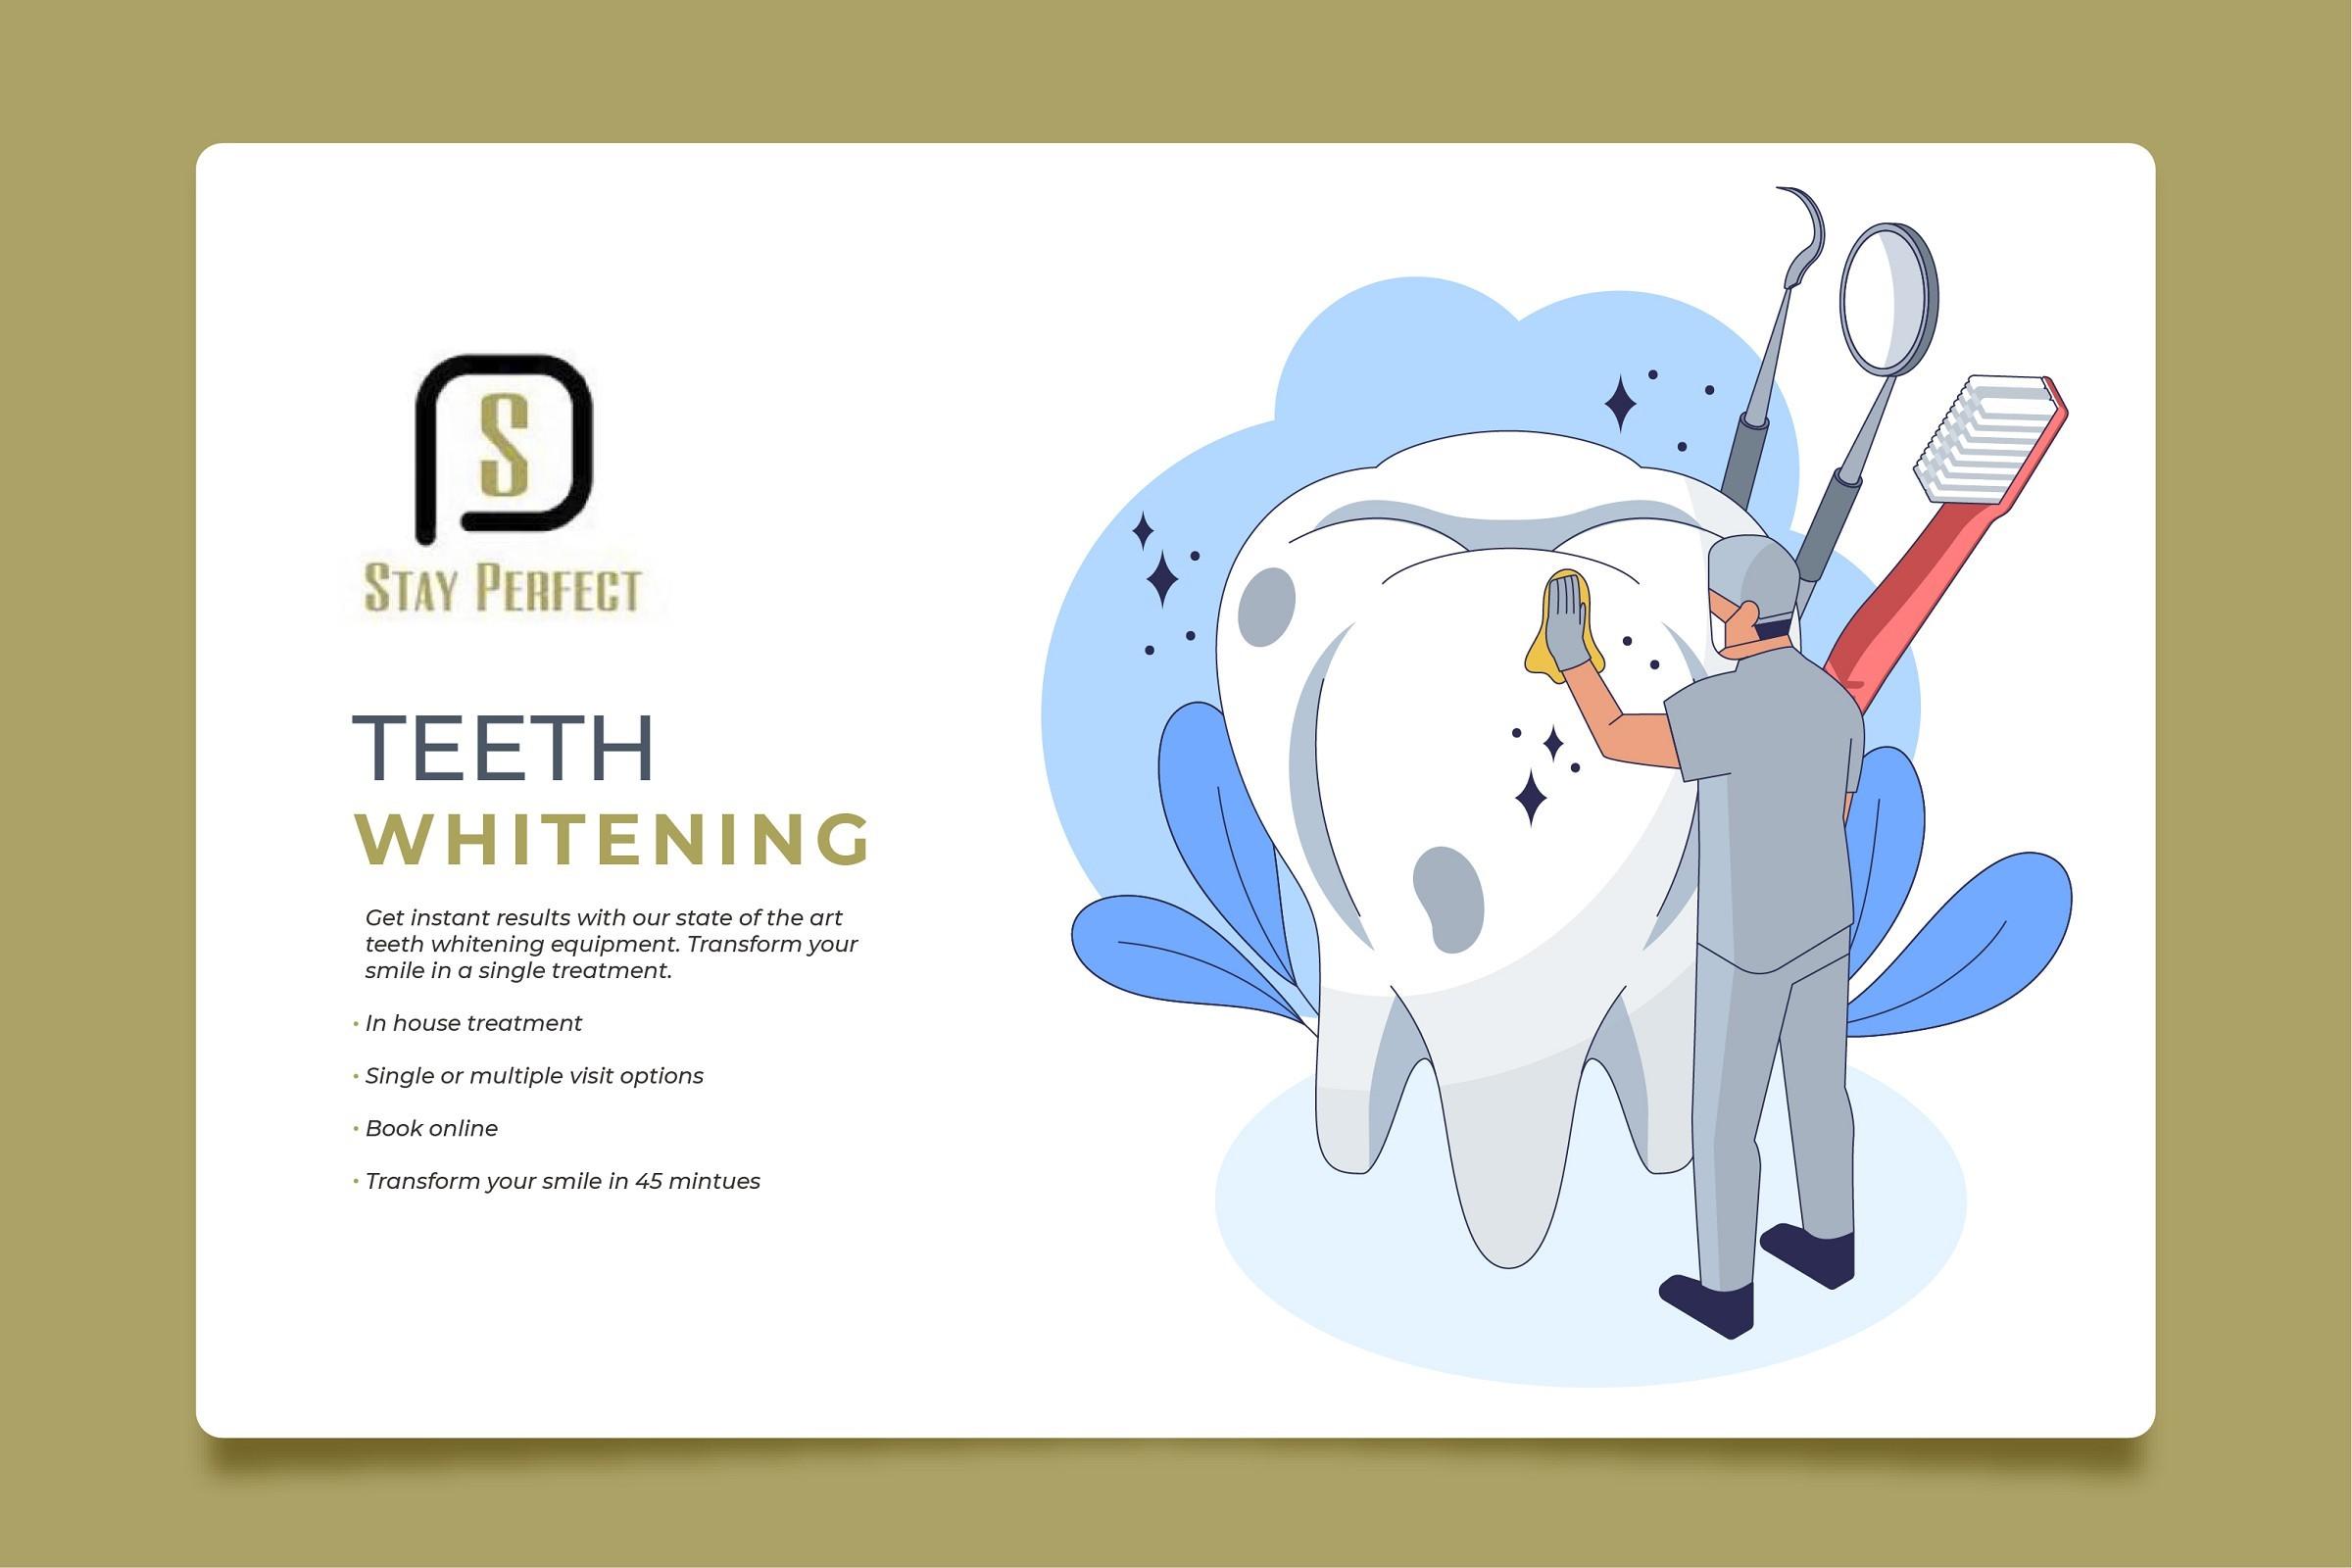 Best teeth whitening Melbourne |Professional Teeth whitening